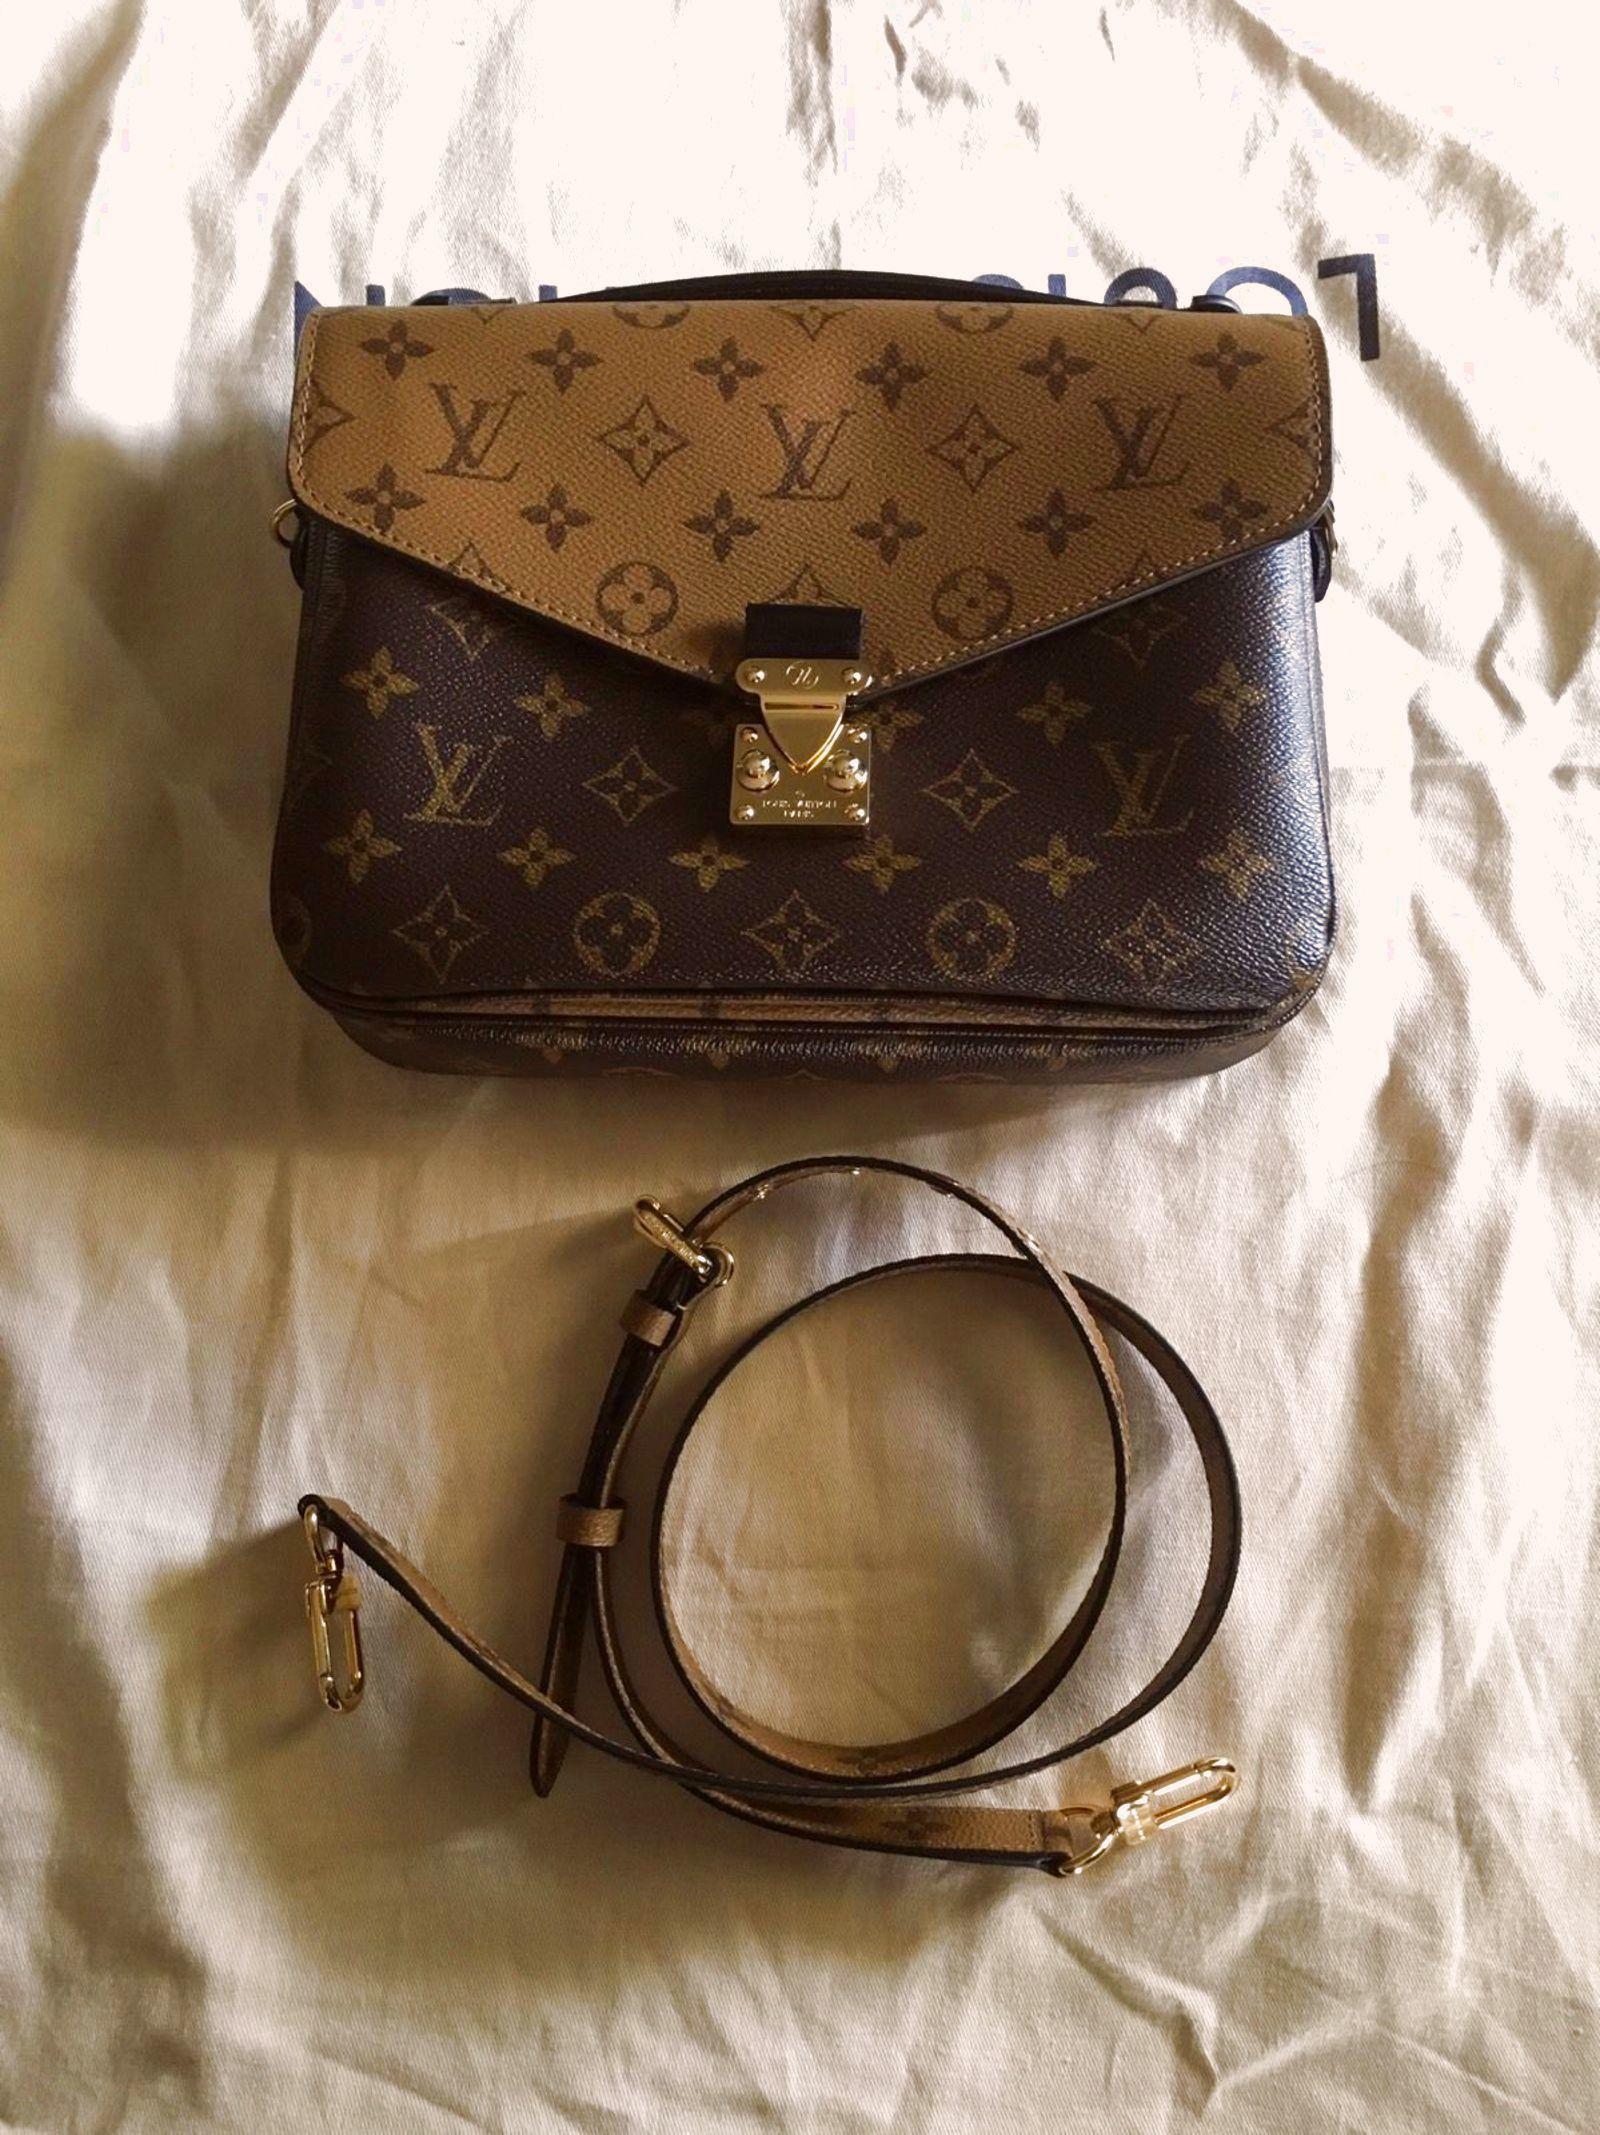 Authentic Louis Vuitton Pochette Metis Reverse Monogram Crossbody  1950.0 b1b03ecc86add